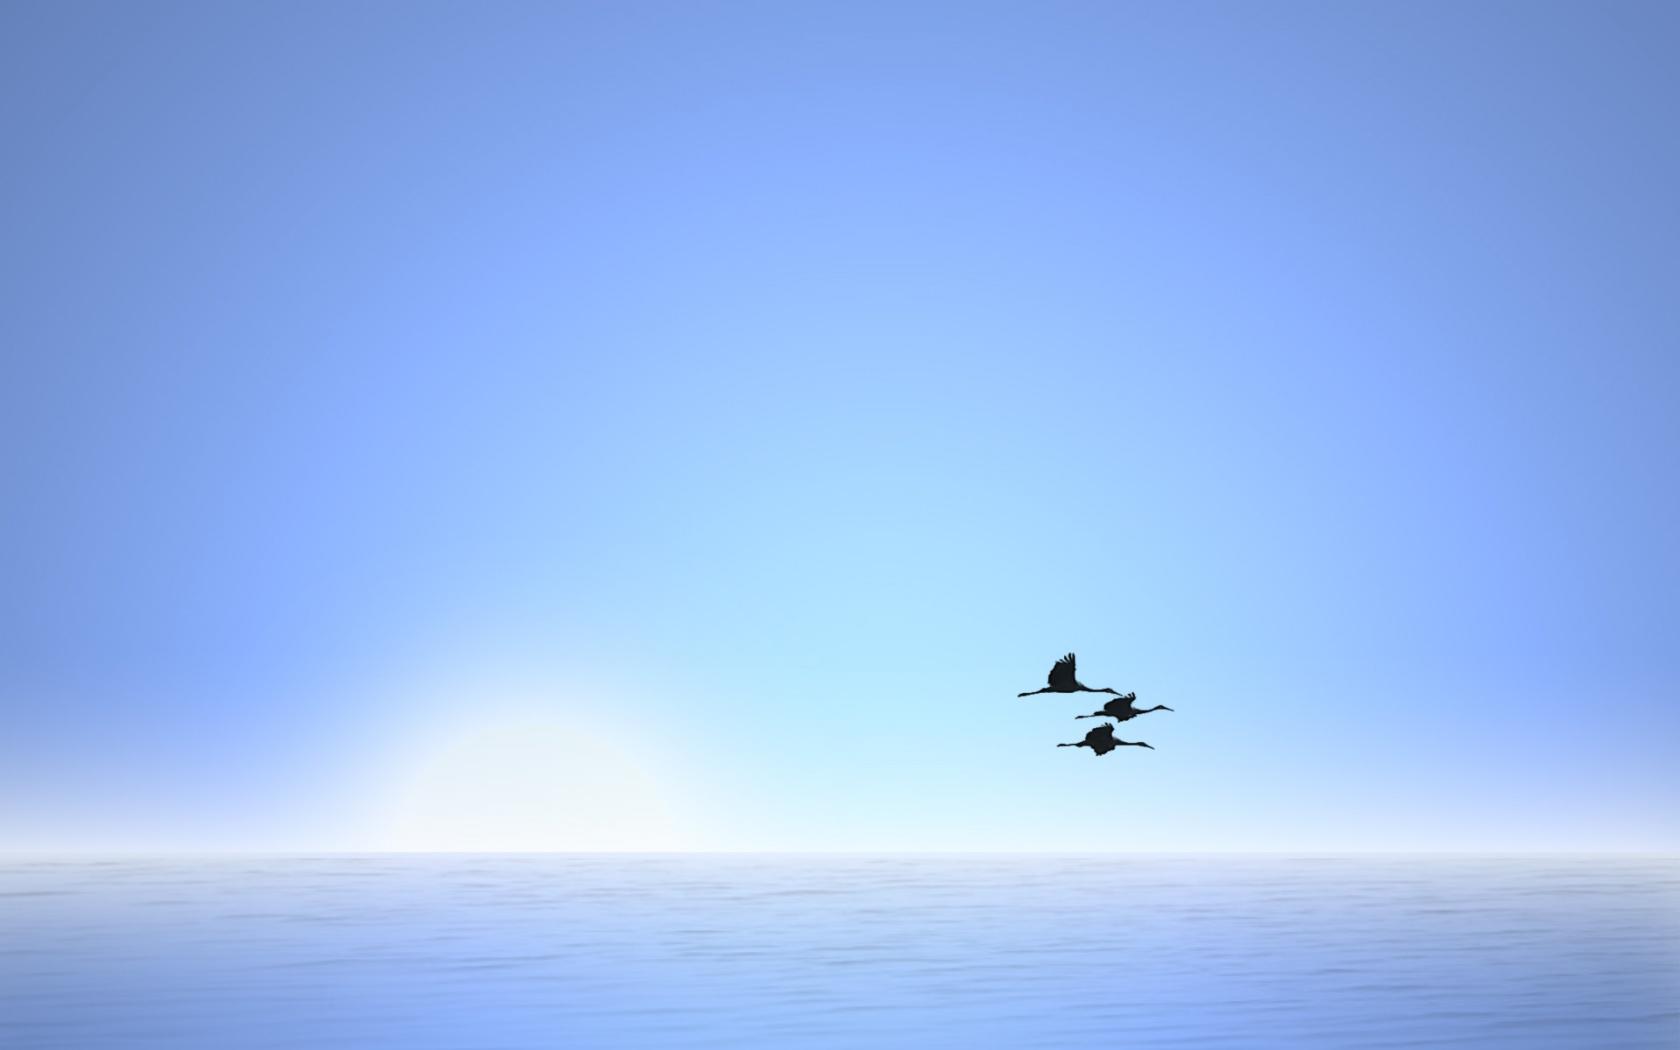 free in flight wallpaper 38340